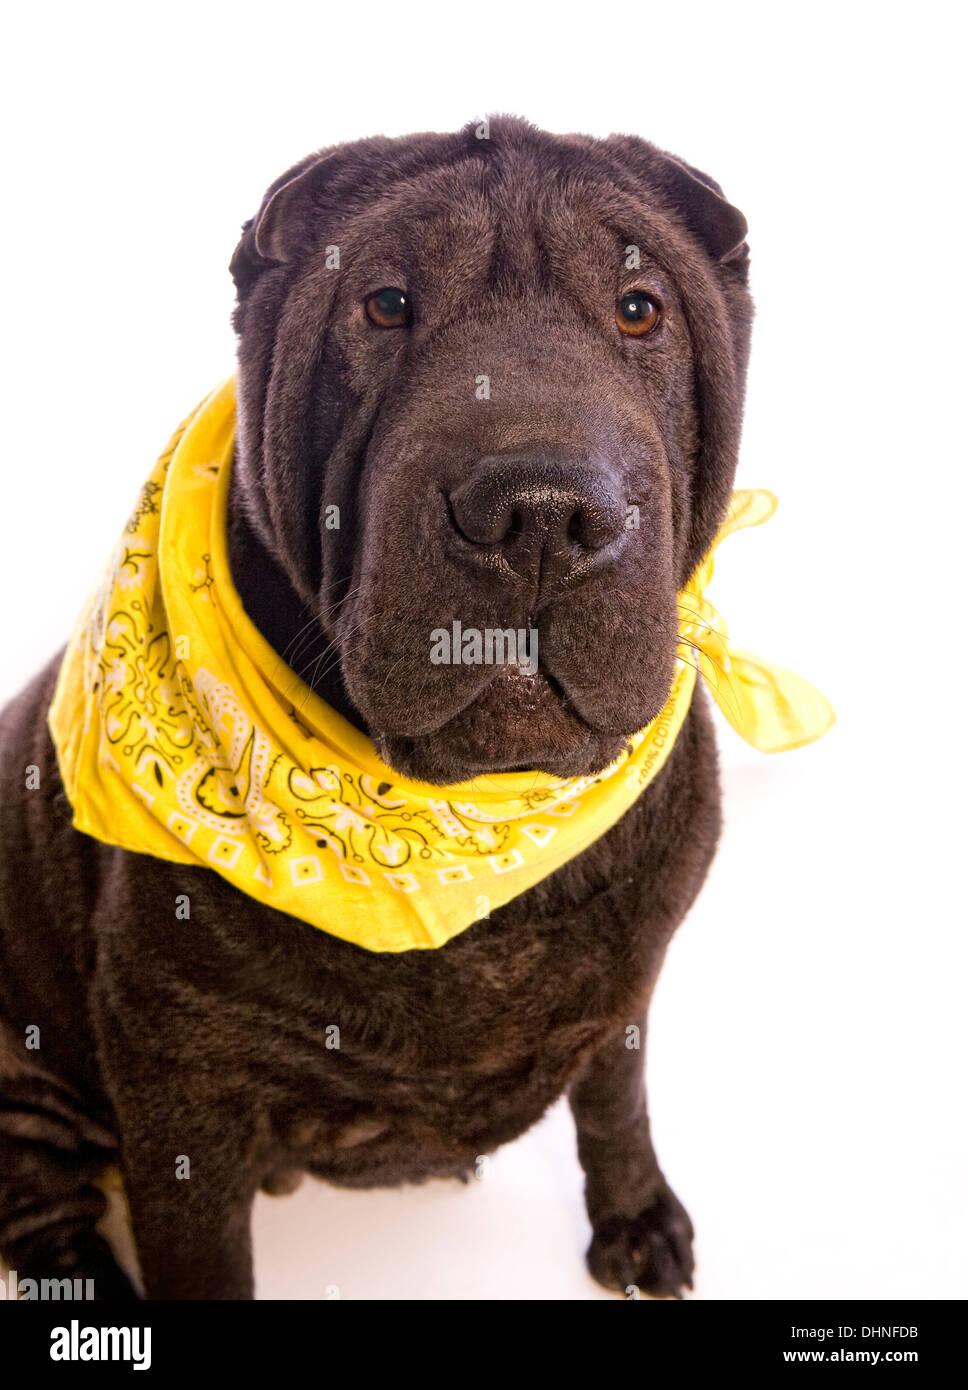 Black Shar Pei Dog Wearing Yellow Scarf Isolated On White Background